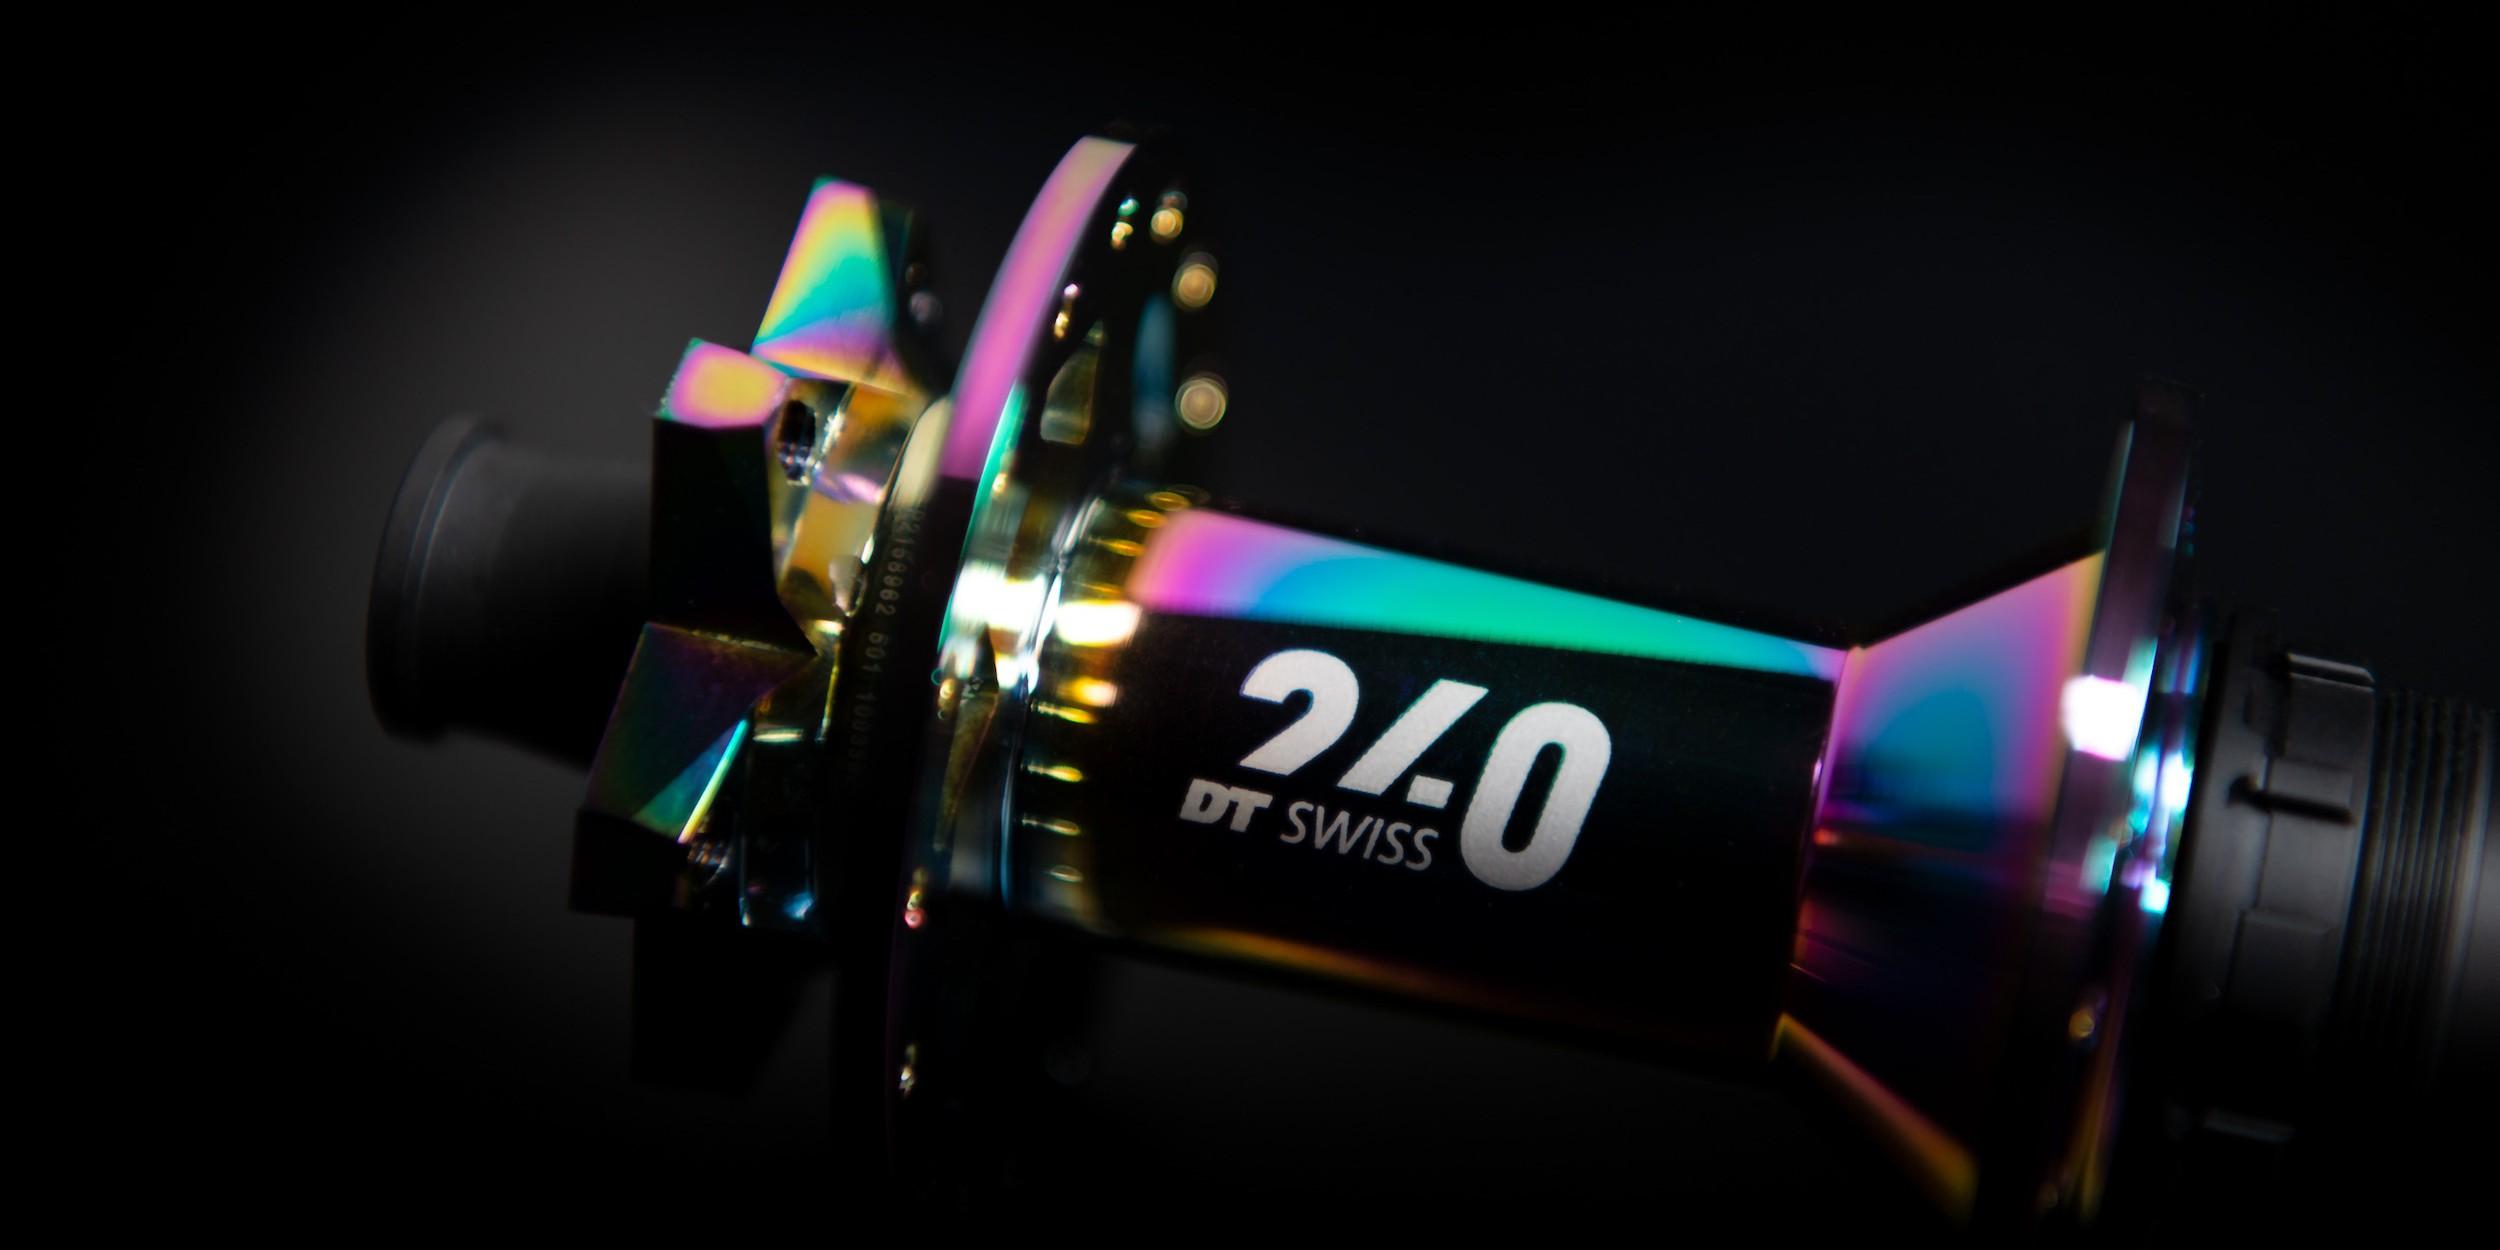 DT Swiss 240 Oil Slick Limited